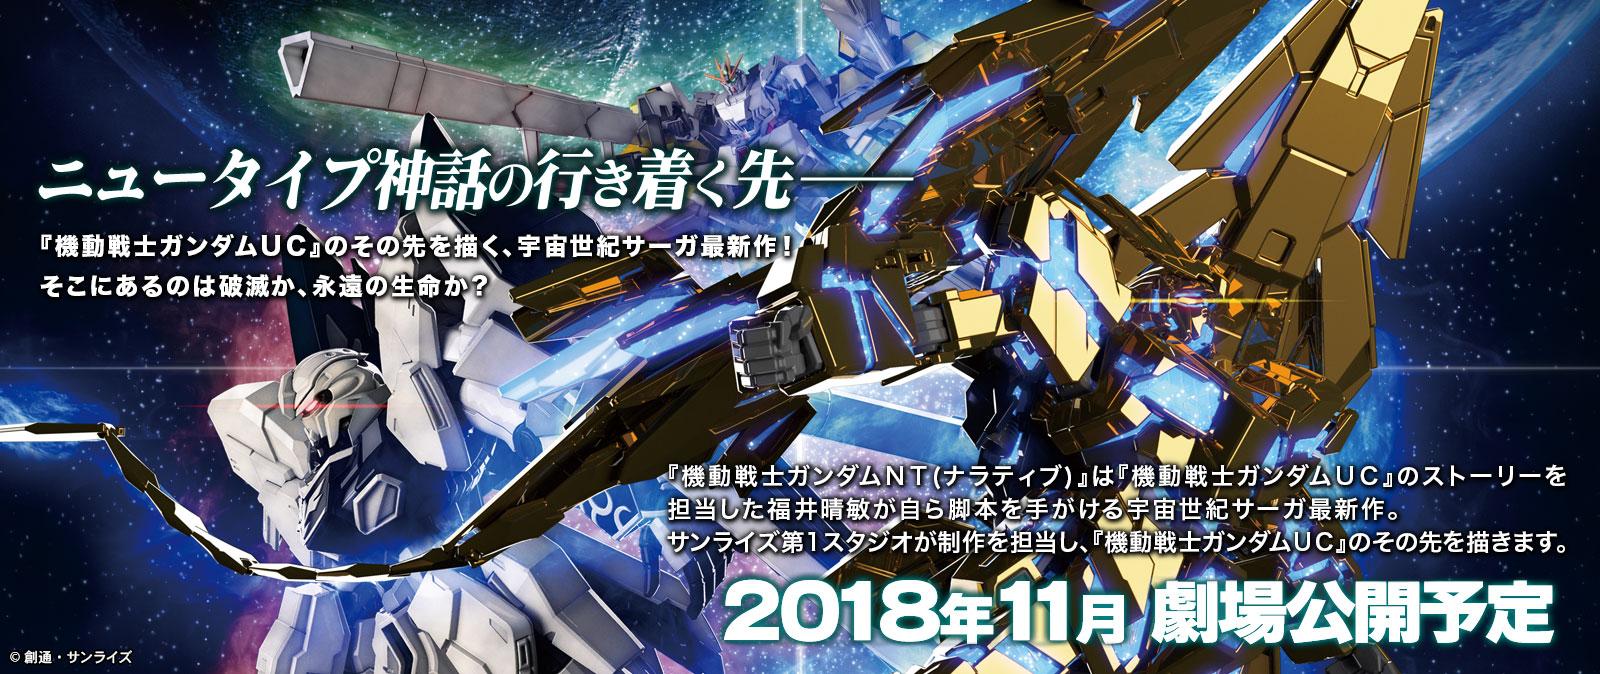 Gundam - Metal Robot Side MS (Bandai) - Page 6 MYdap2Be_o